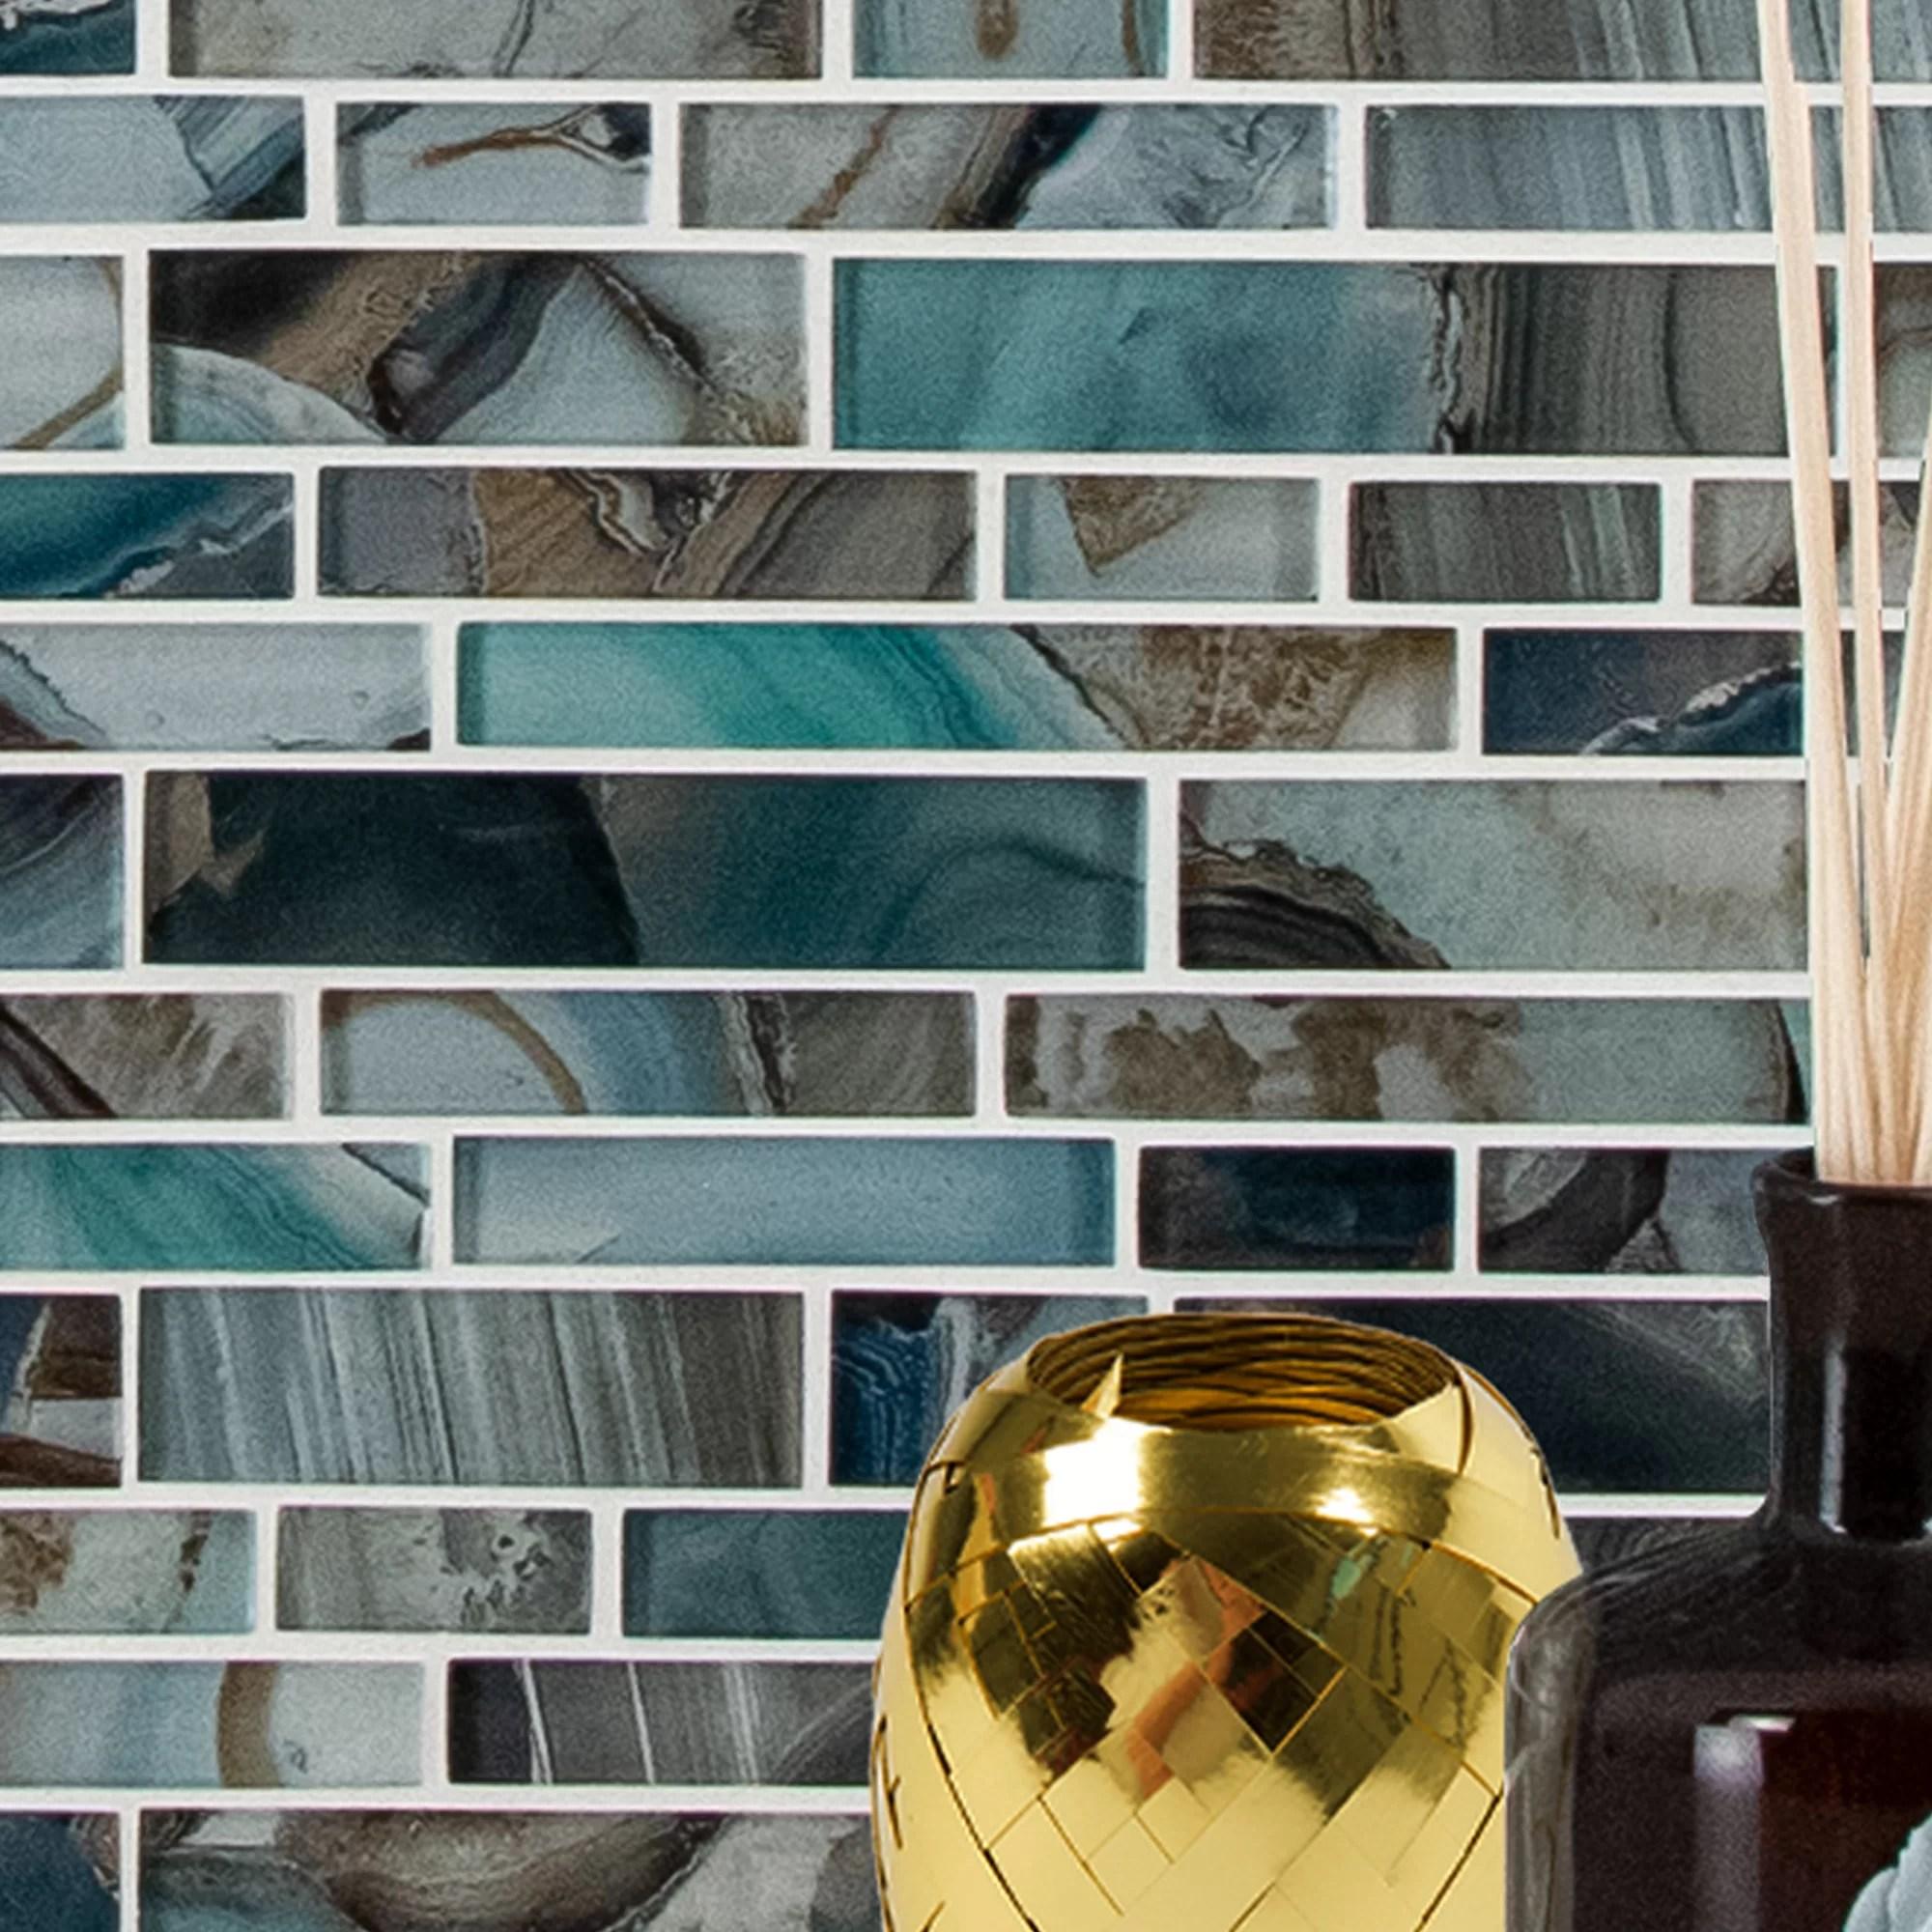 night sky interlocking glass mosaic tile in blue